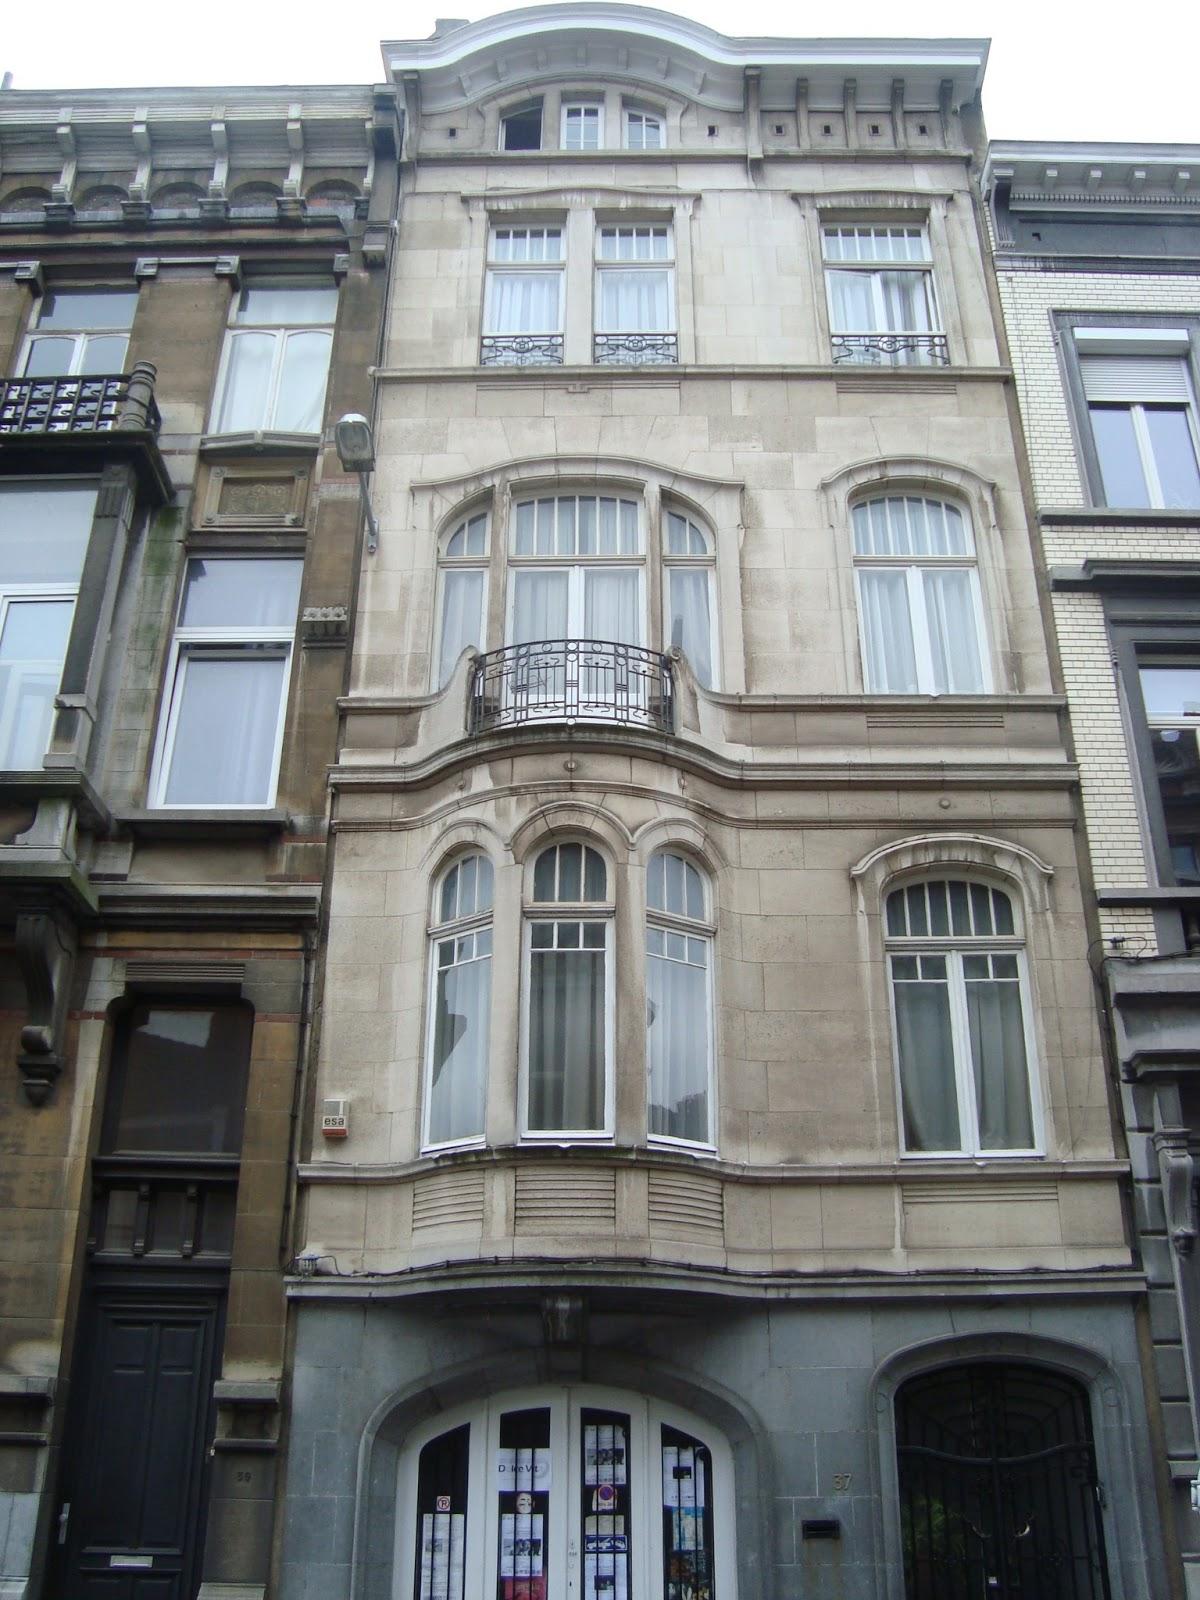 paseos art nouveau porte 39 37 rue van elewyck ixelles architecte jules mataigne 1909. Black Bedroom Furniture Sets. Home Design Ideas